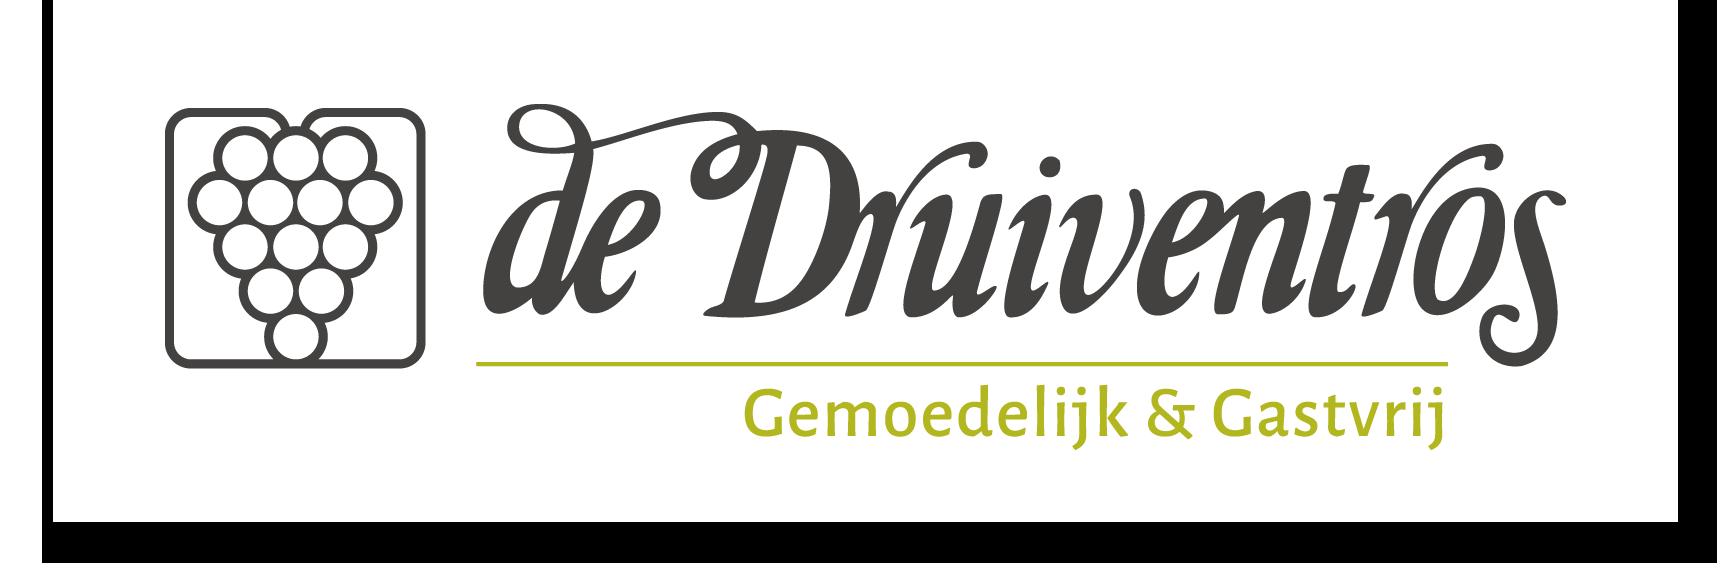 Logo | Hotel de Druiventros